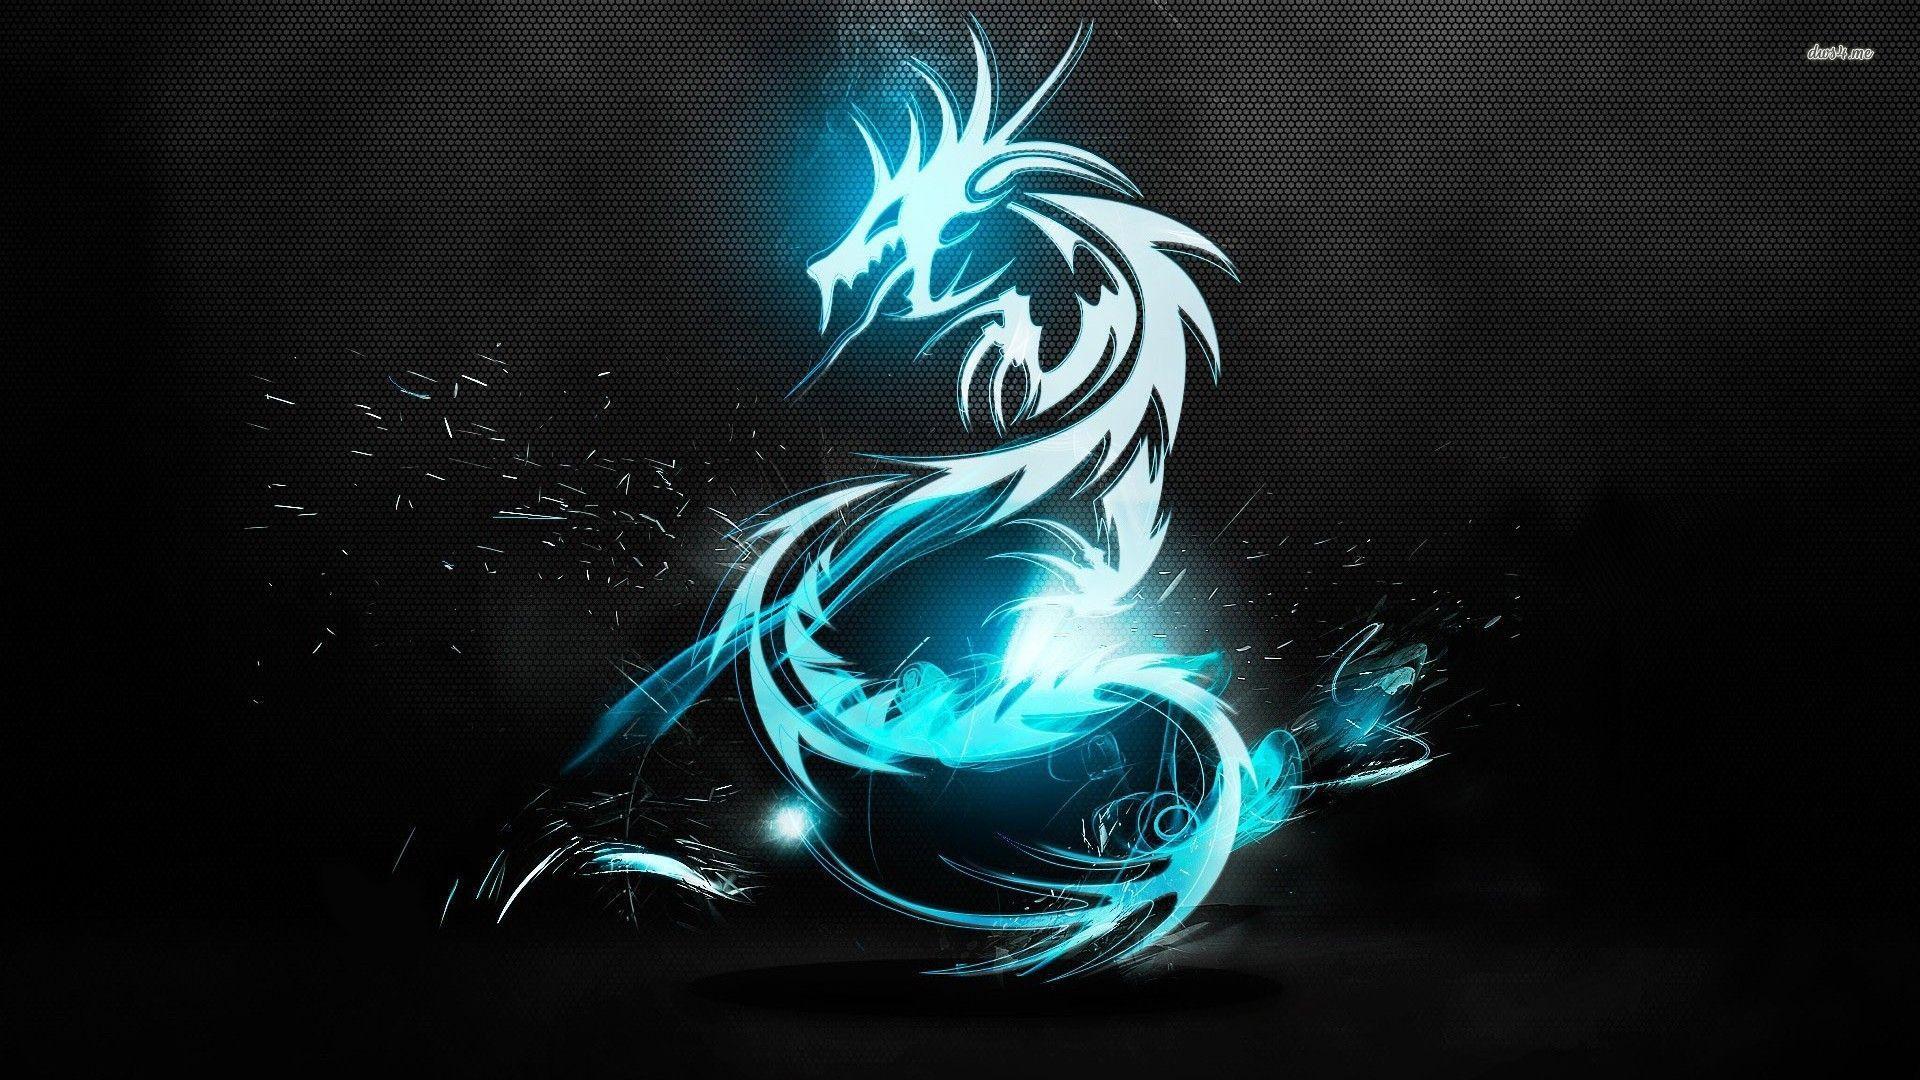 dragon symbol wallpapers wallpaper